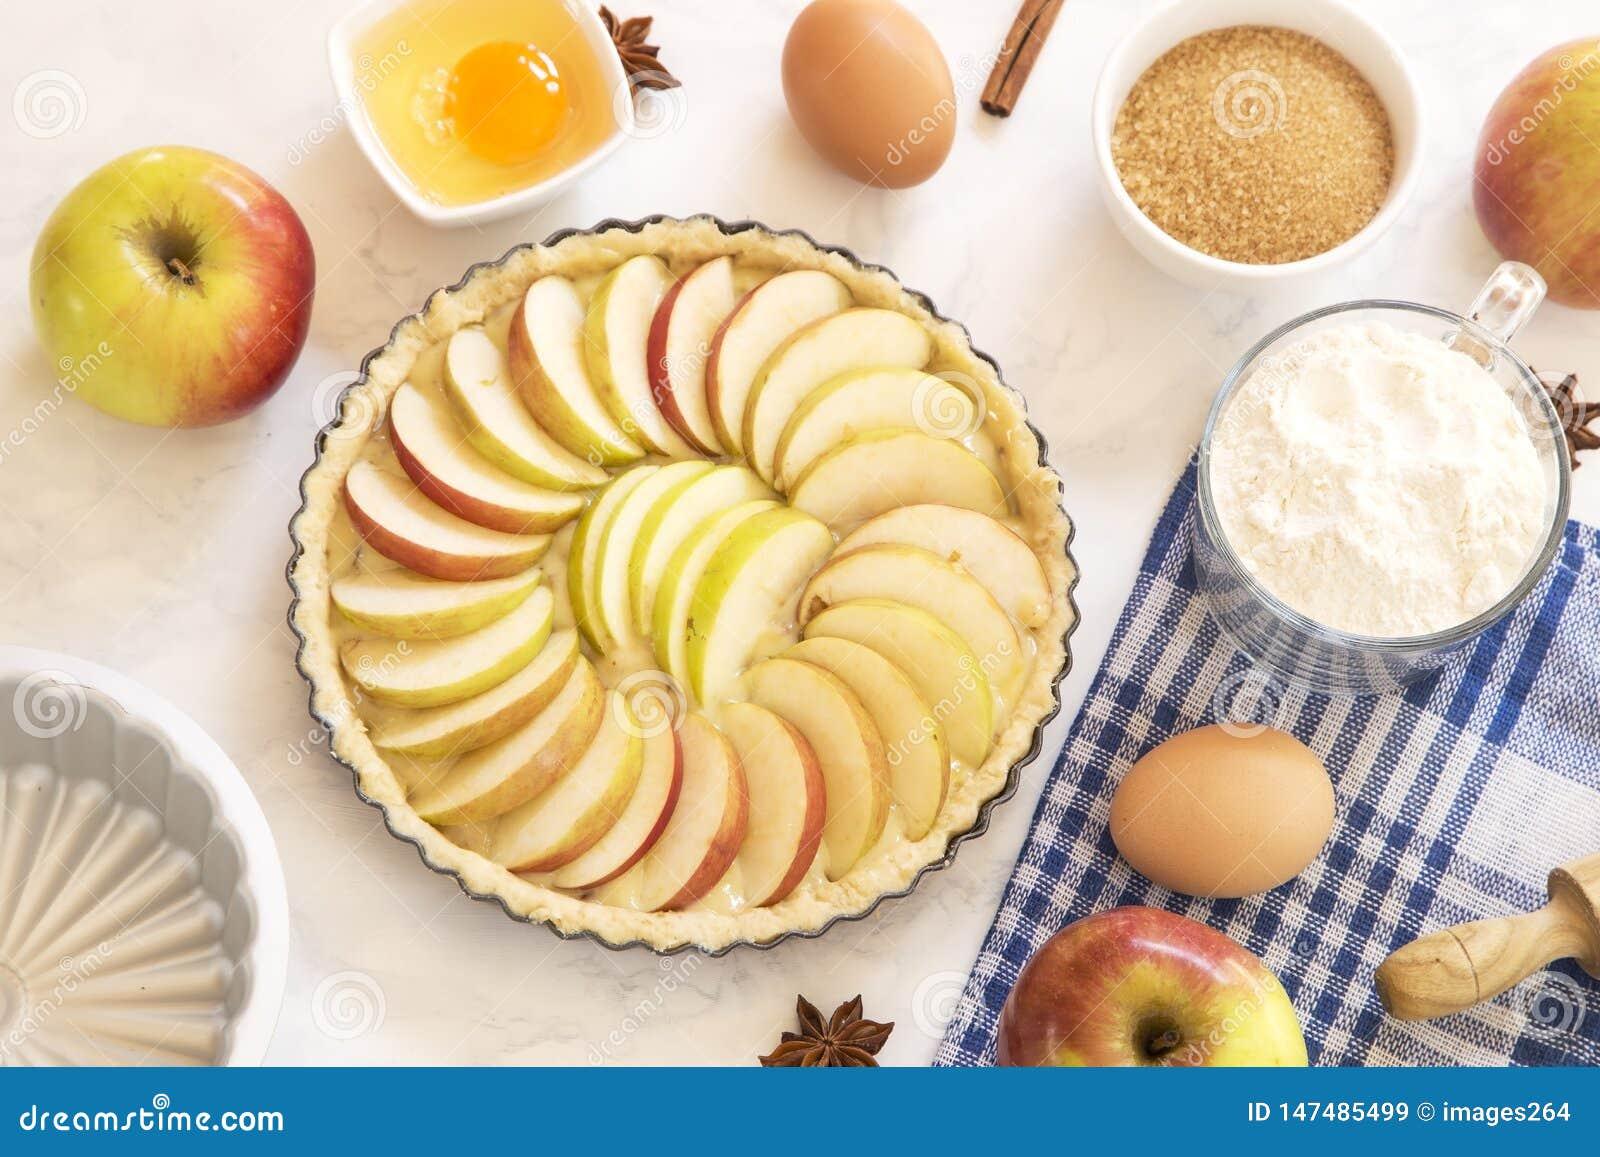 Apple pie preparation